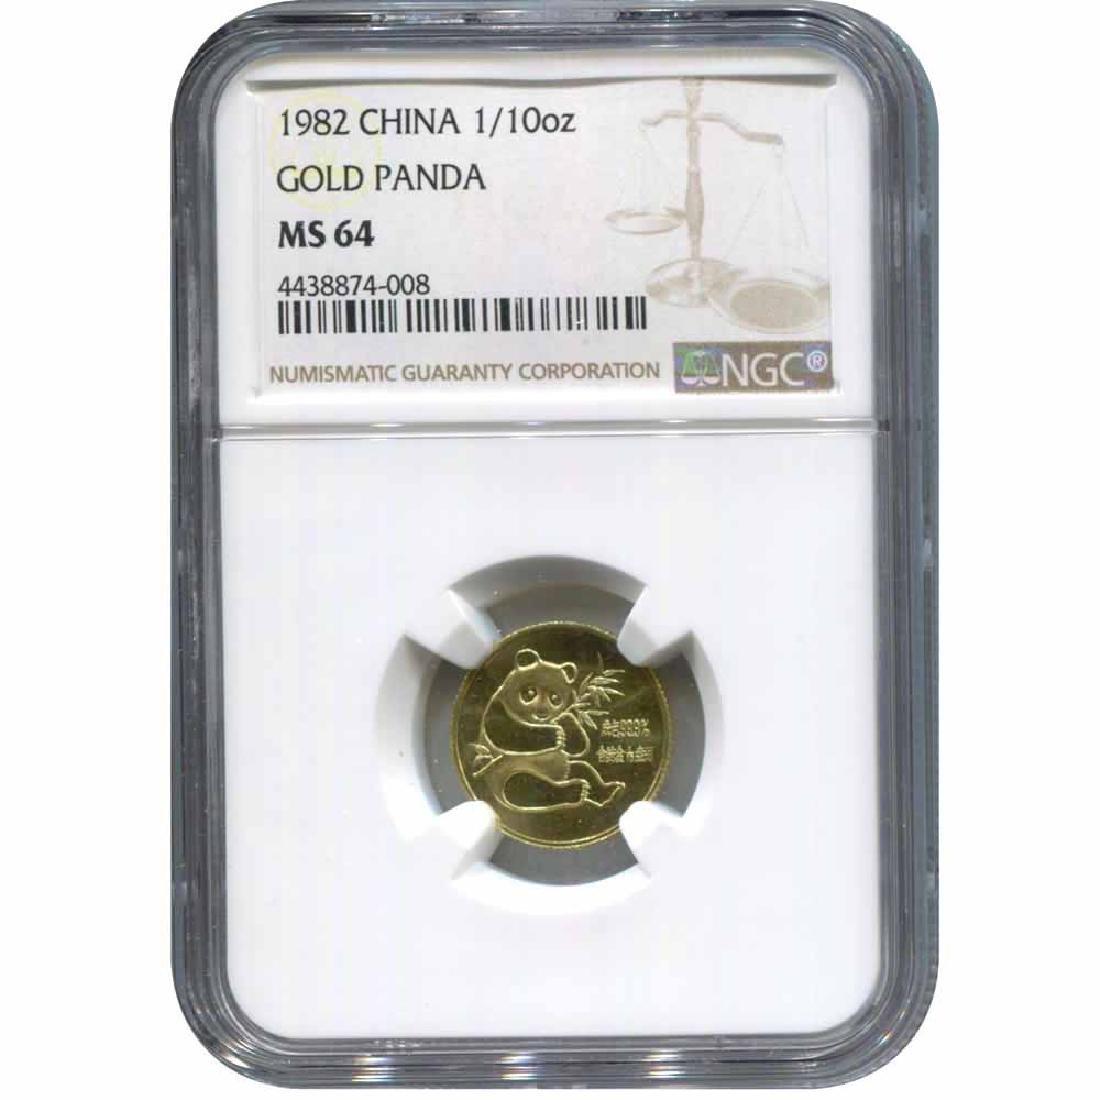 China Tenth Ounce Gold Panda 1982 MS64 NGC